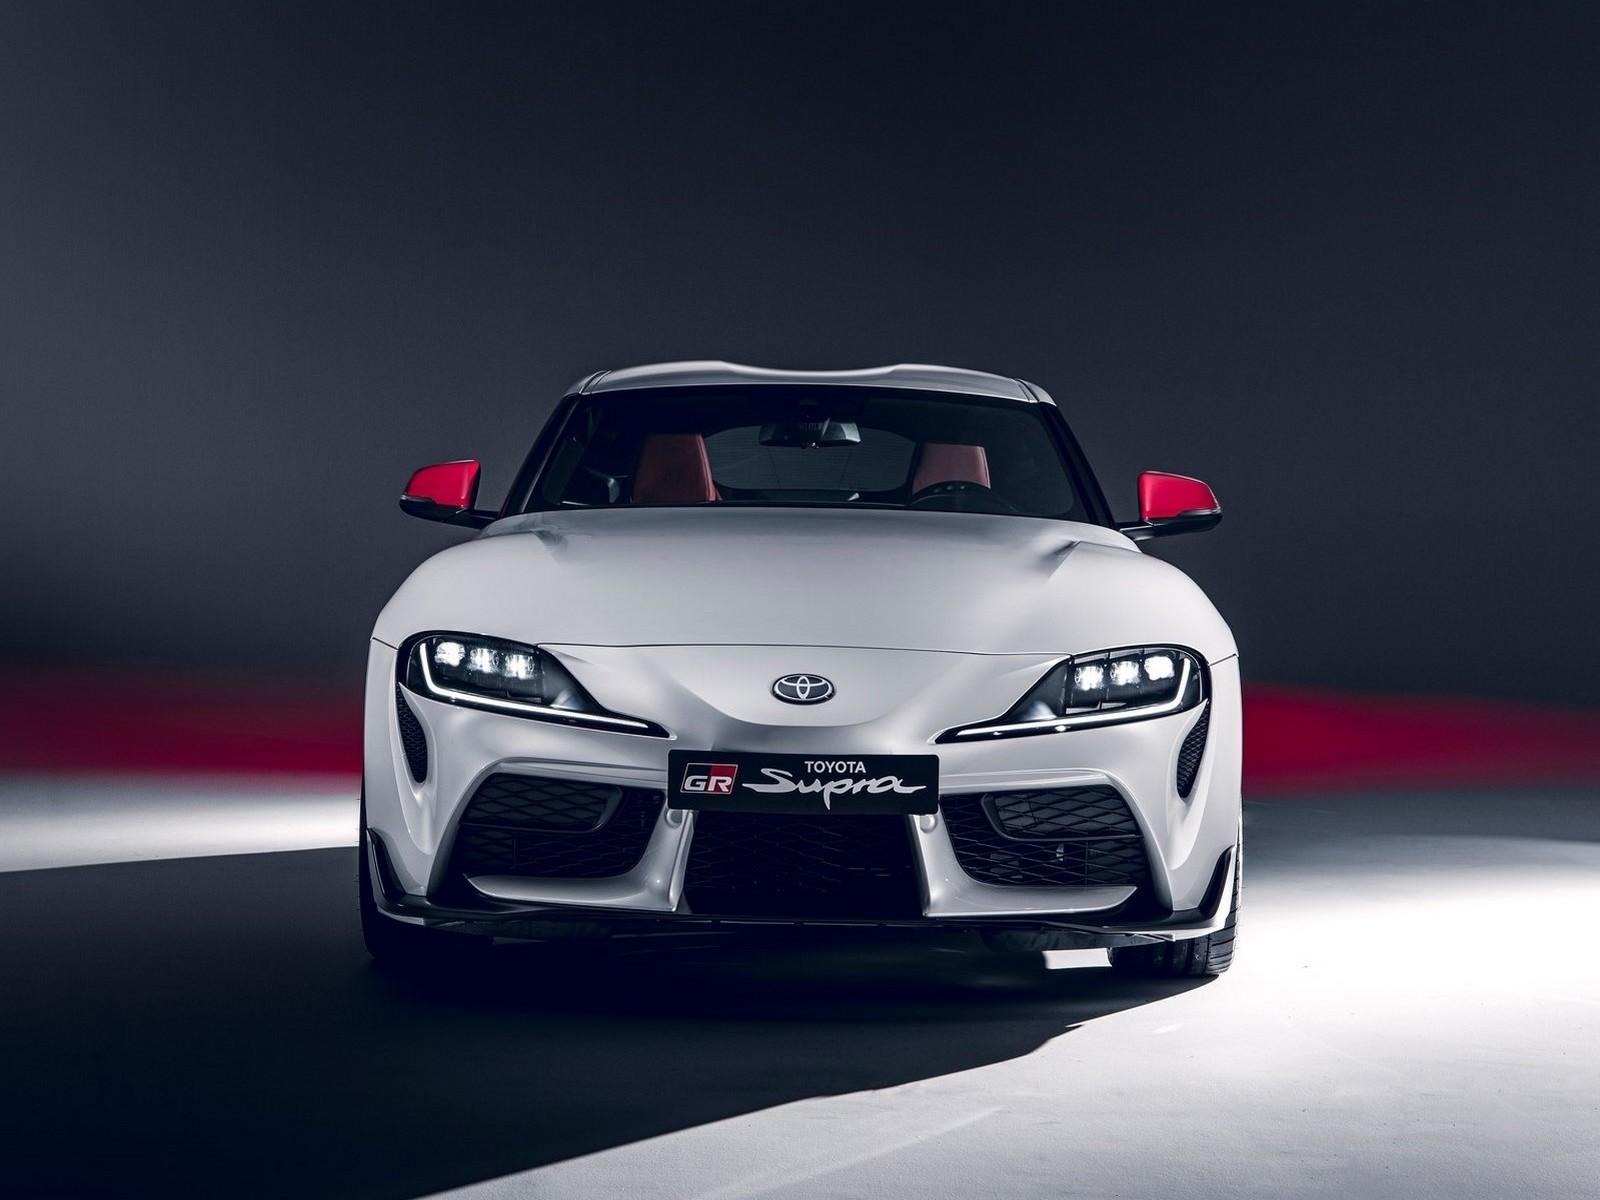 Toyota Supra 2.0 L Turbo 2020